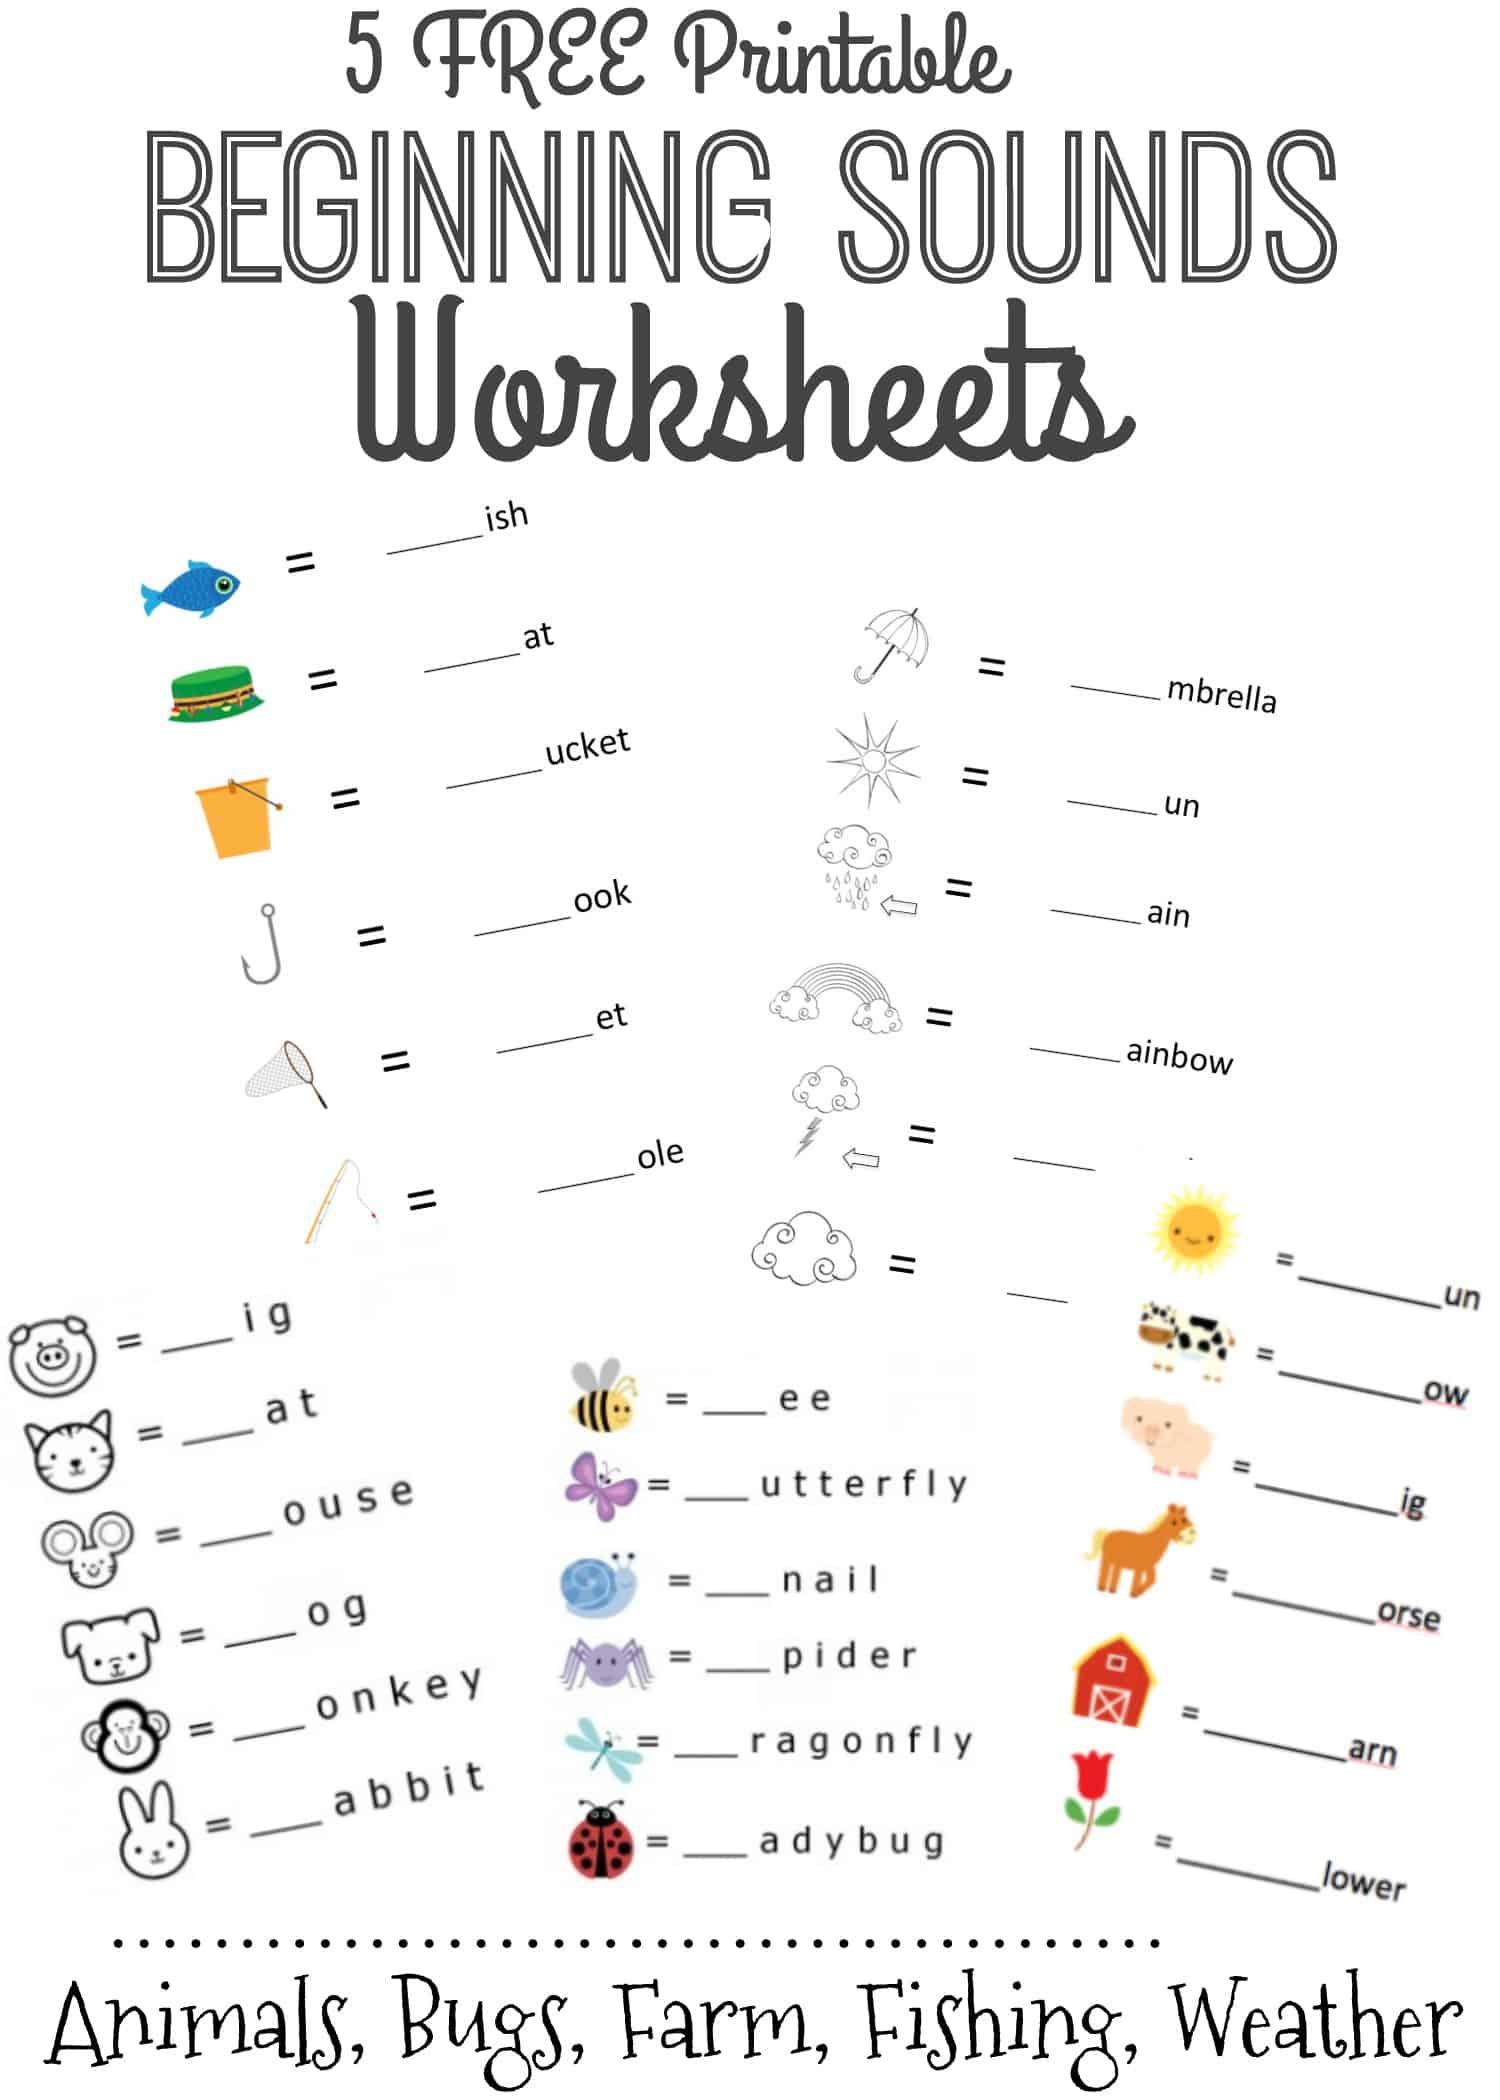 Beginning Sound Worksheets Kindergarten Worksheets Initial